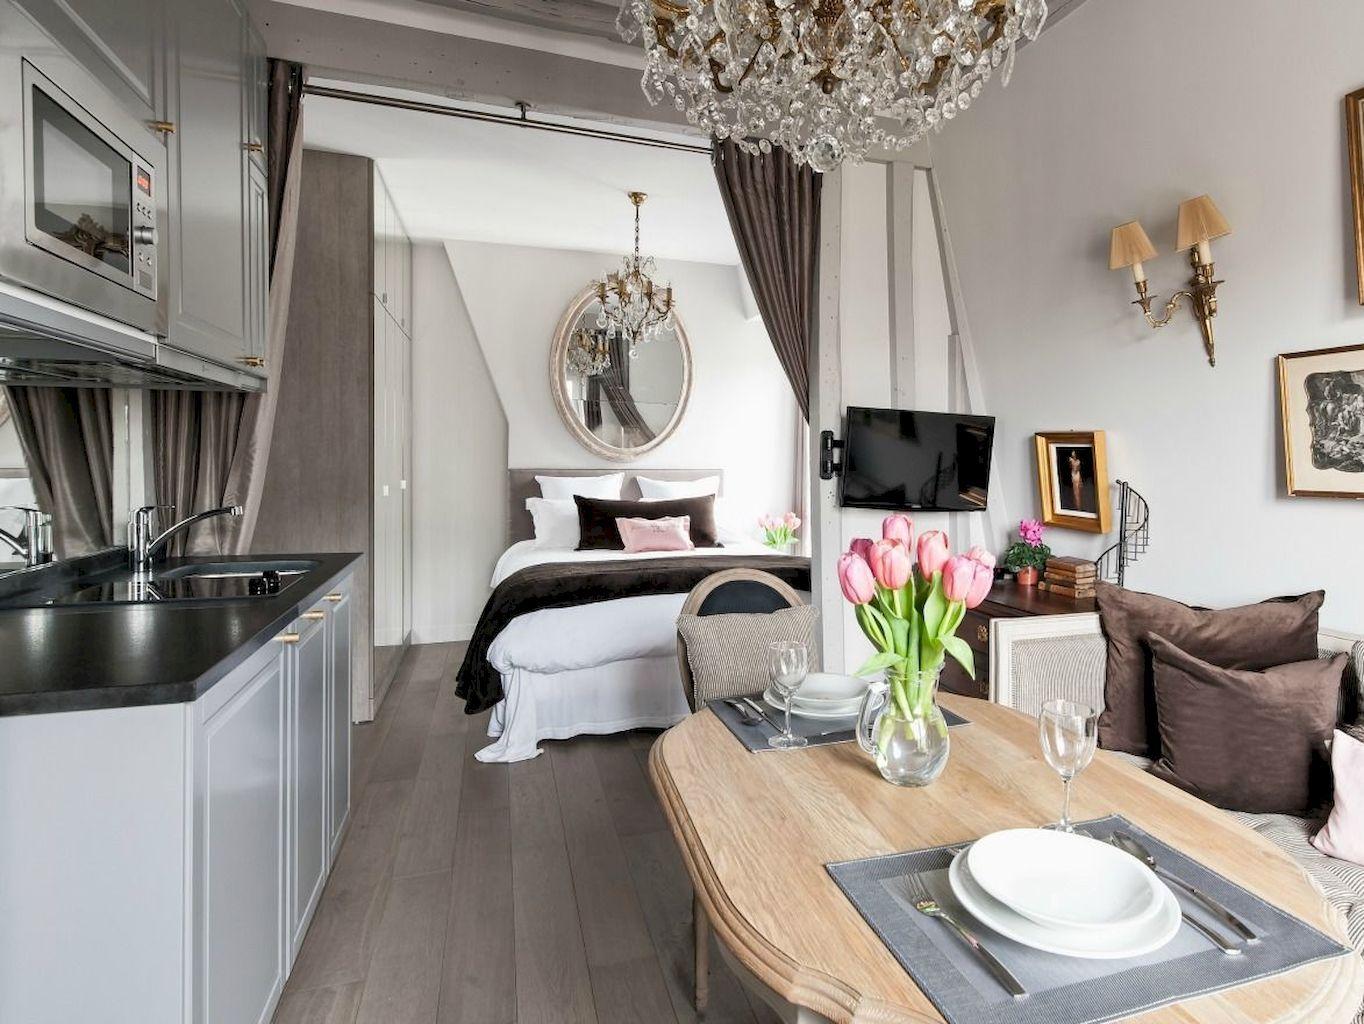 55 Inspiring Grey Studio Apartment Decorating Ideas on a Budget ...